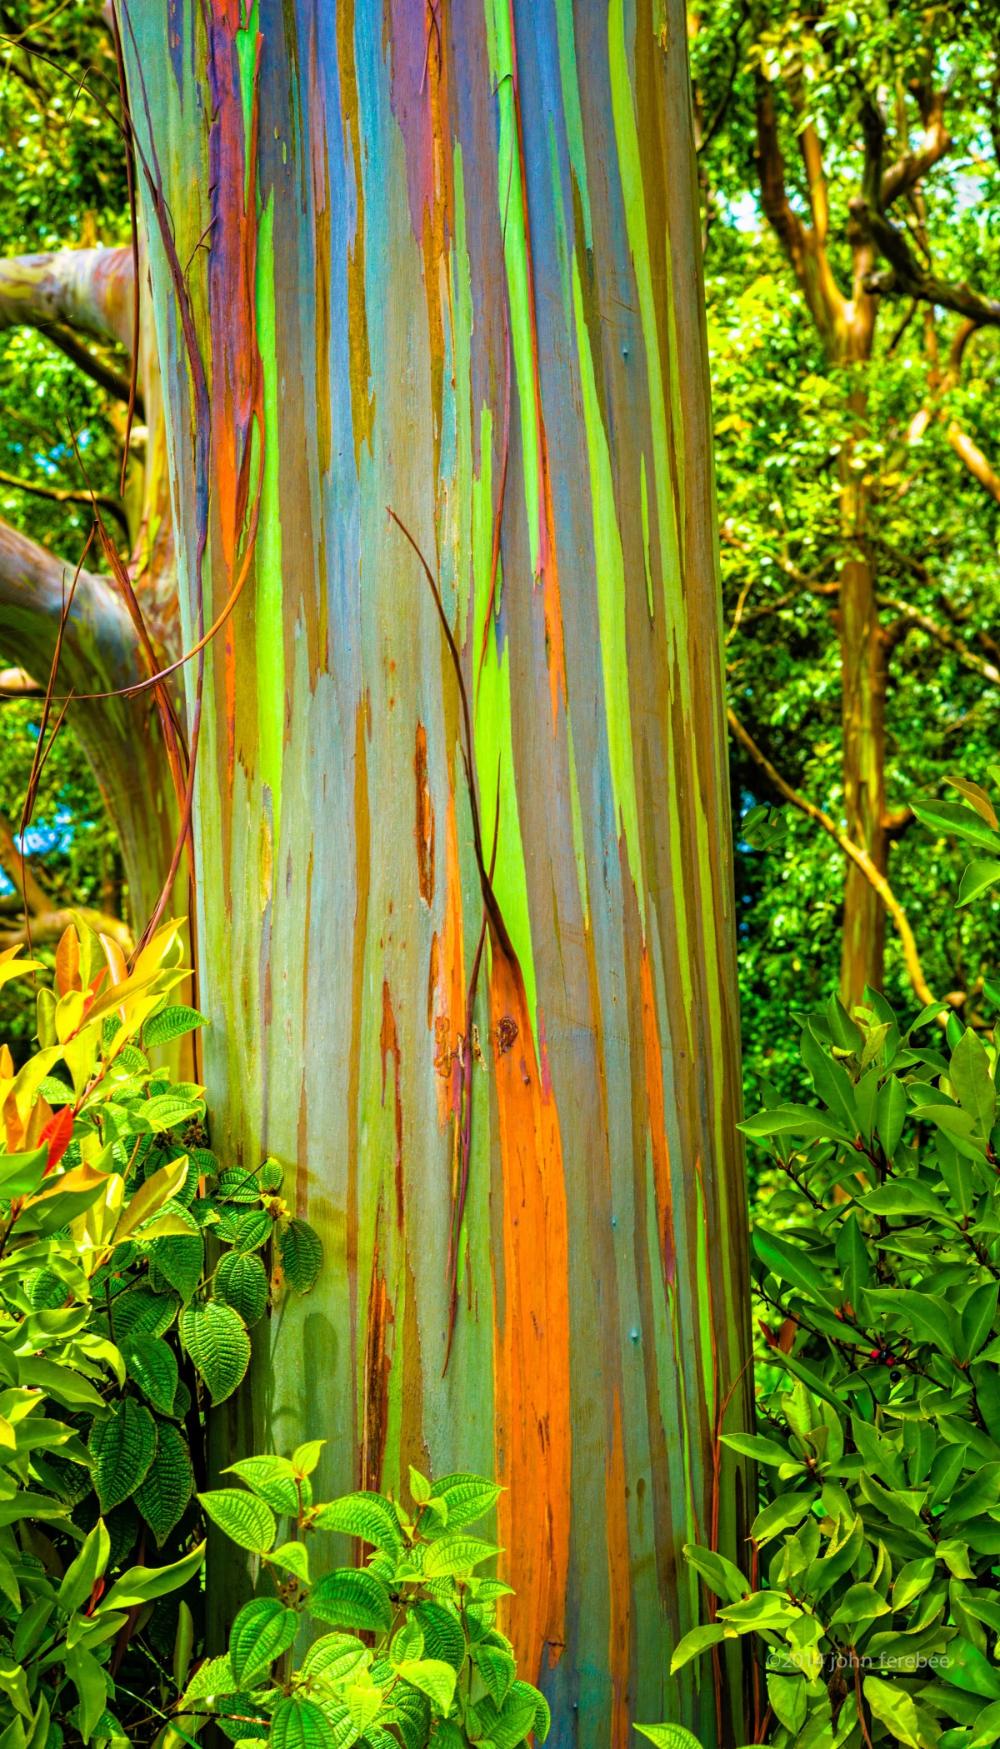 Rainbow Eucalyptus Rainbow Eucalyptus Tree Rainbow Eucalyptus Rainbow Eucalyptus Tree Maui